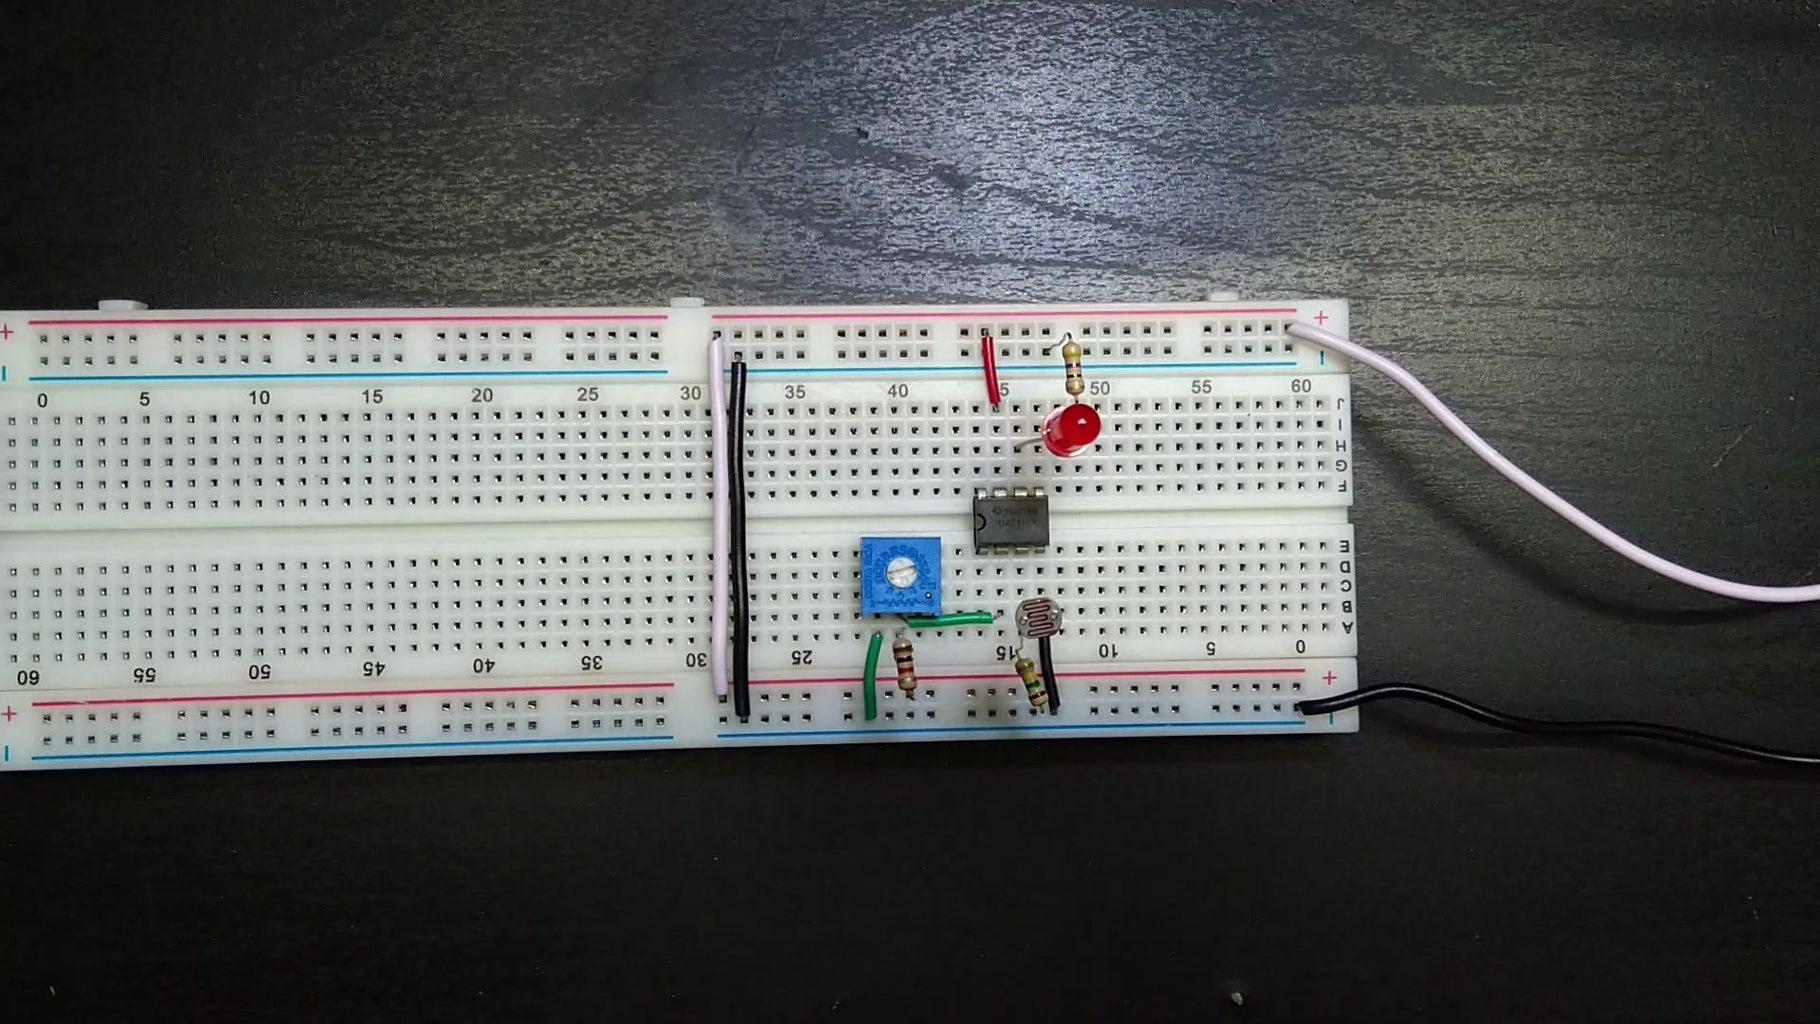 Darkness Sensor Using OpAmp